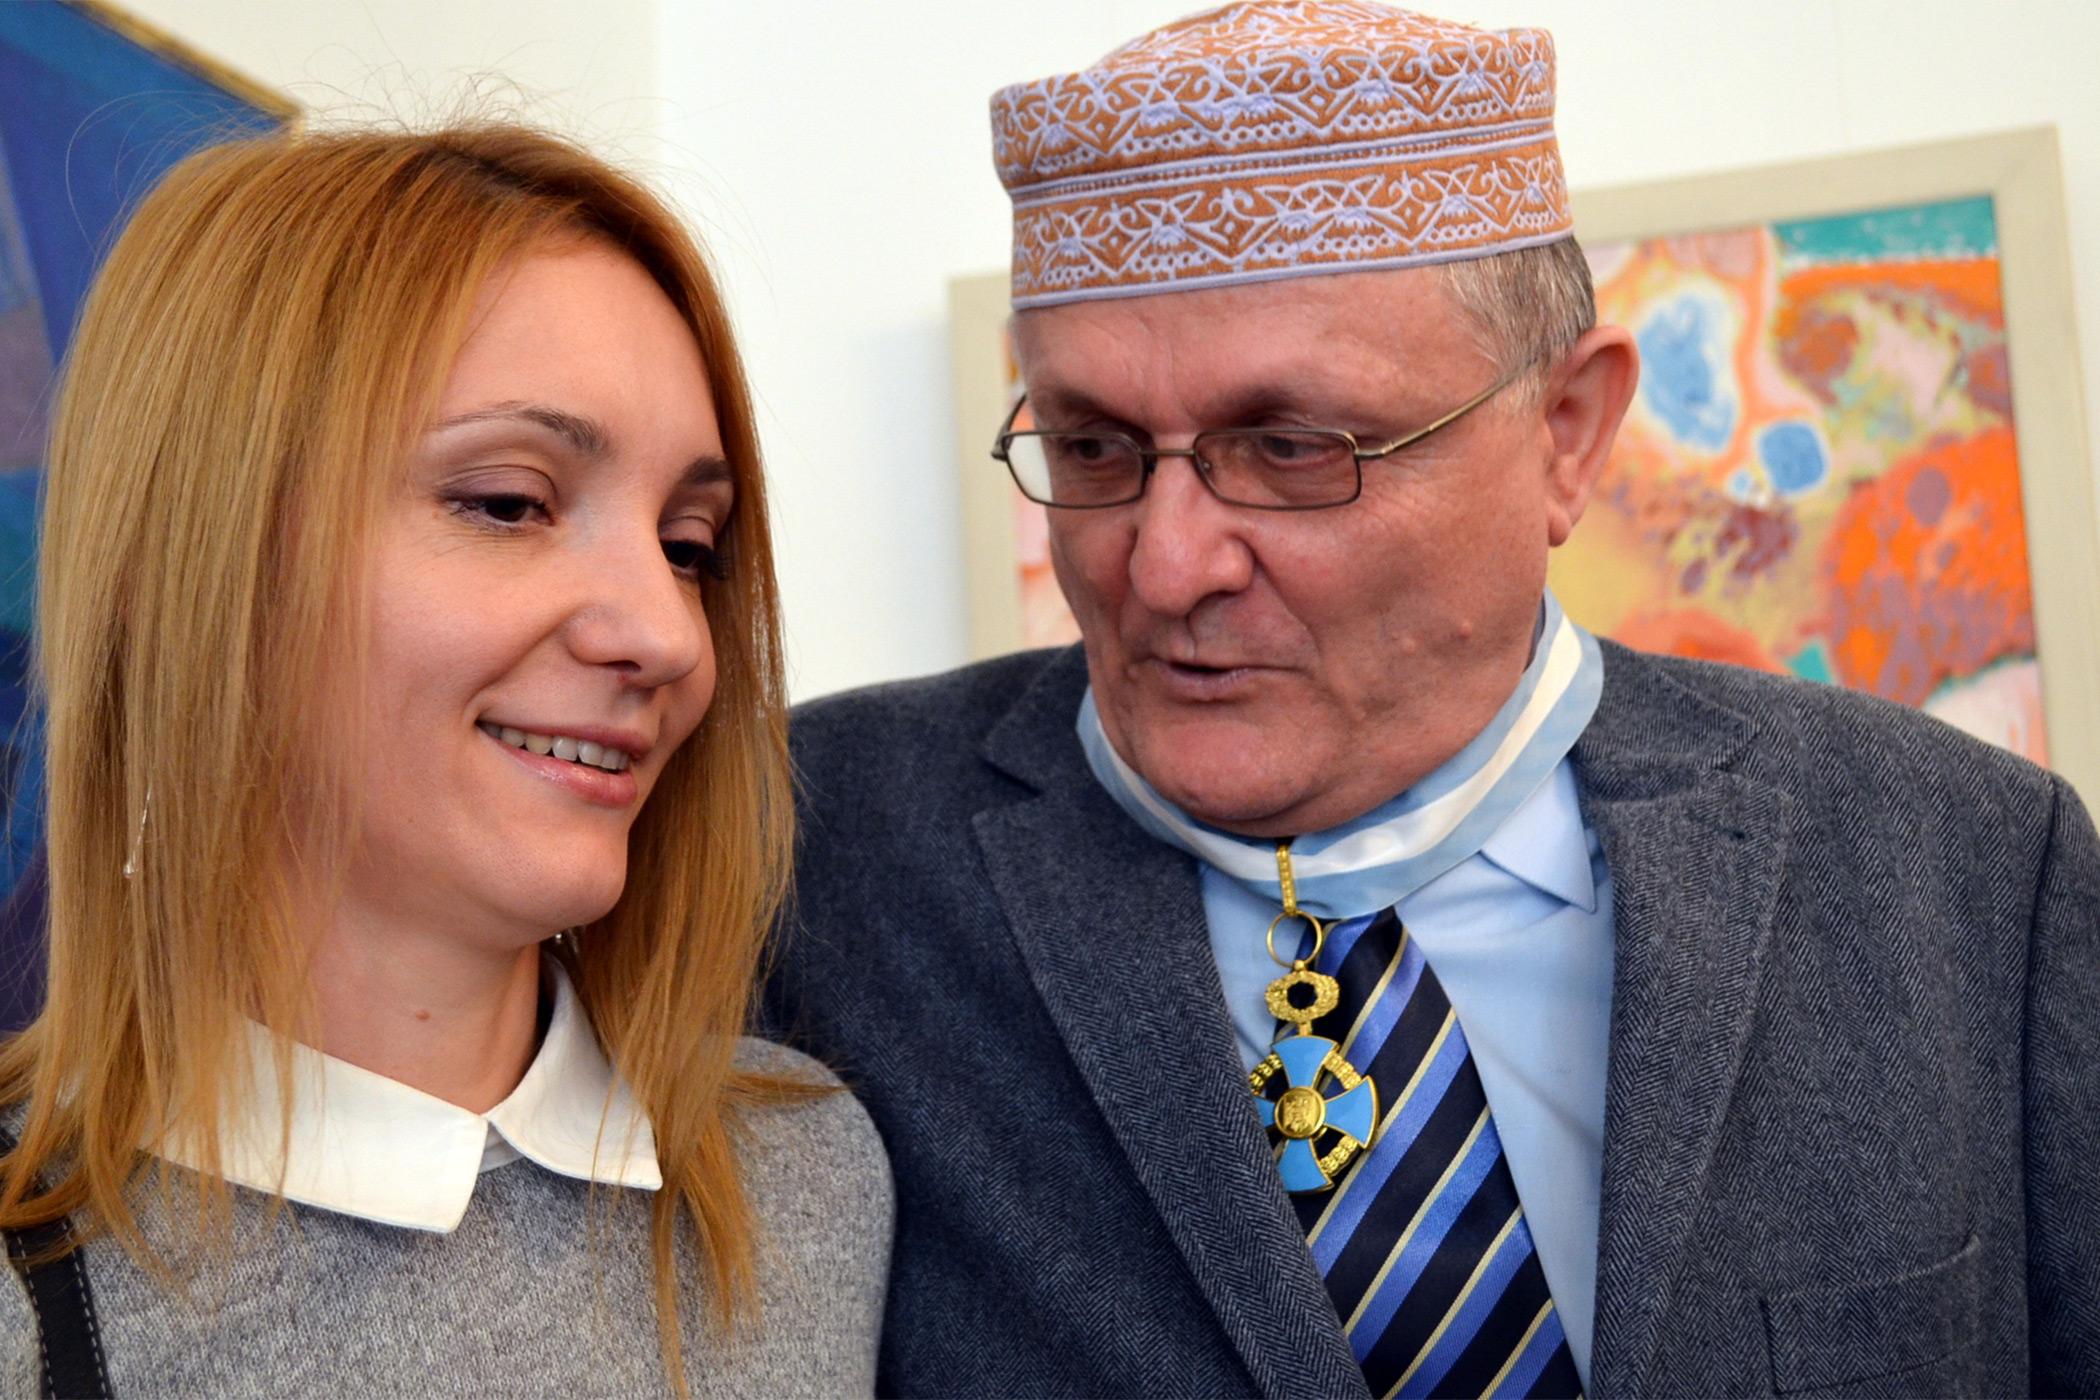 RFE/RL Chișinău Bureau Chief receives Romanian top honor